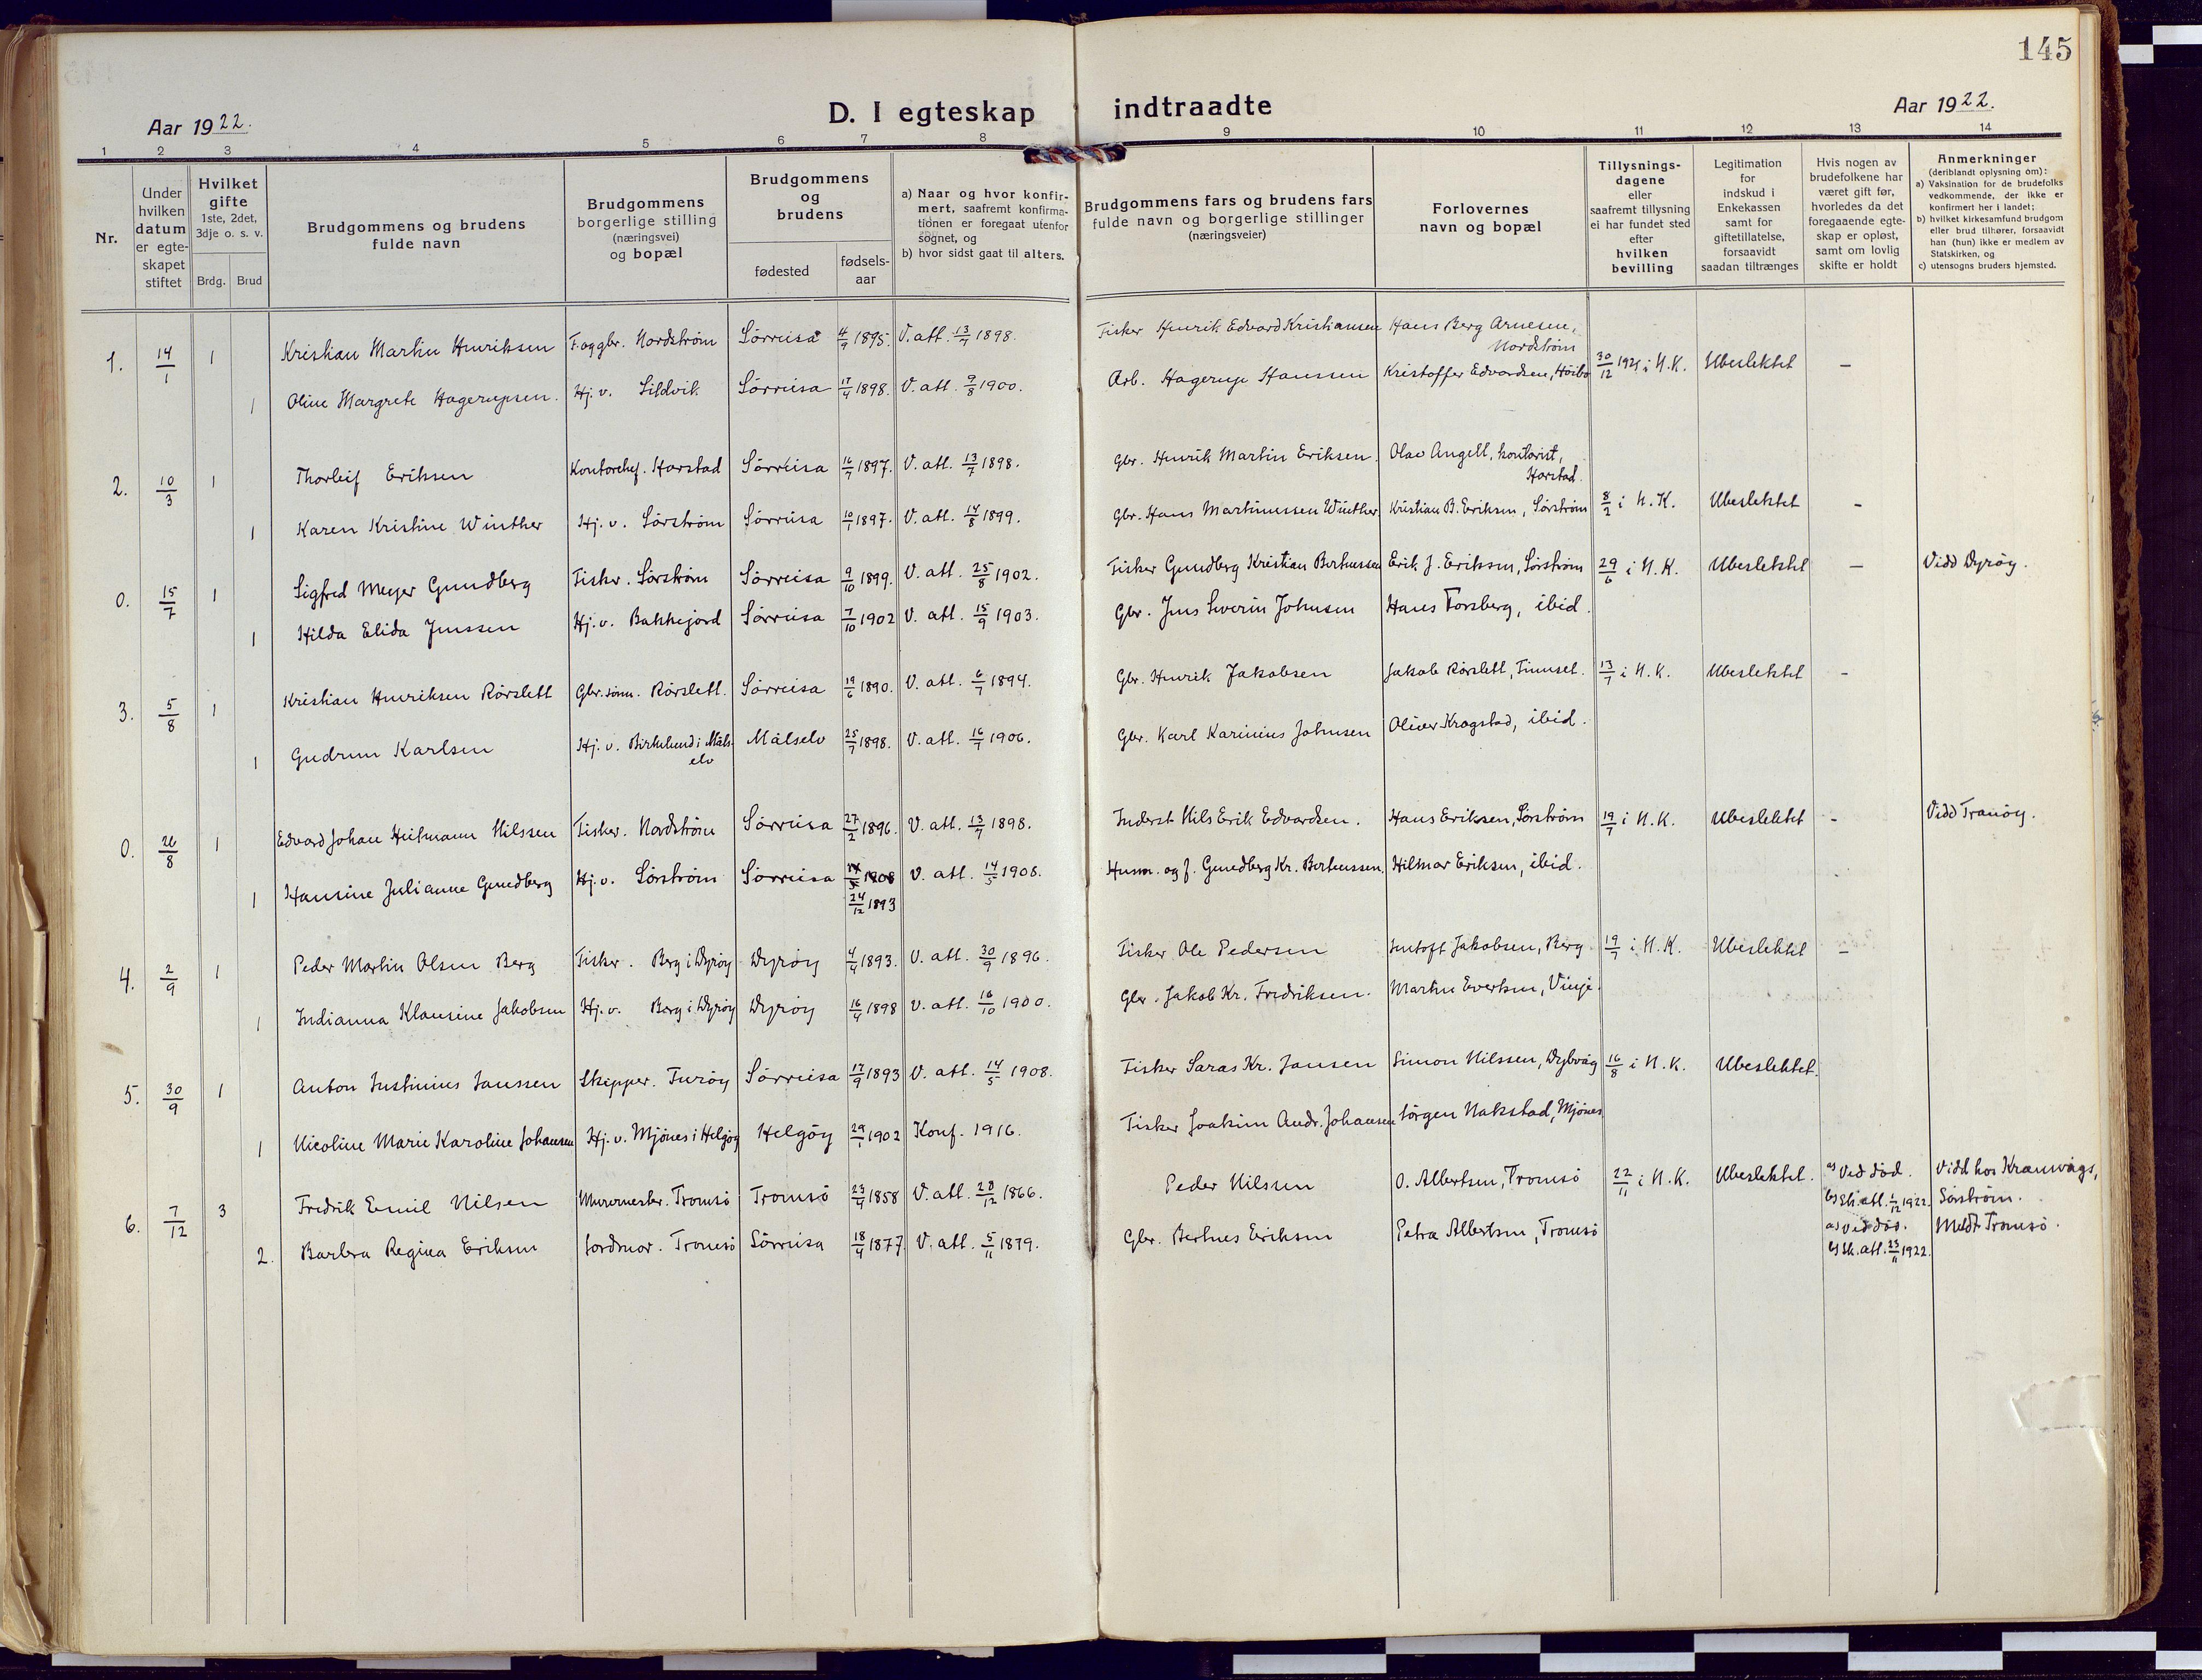 SATØ, Tranøy sokneprestkontor, I/Ia/Iaa/L0015kirke: Ministerialbok nr. 15, 1919-1928, s. 145